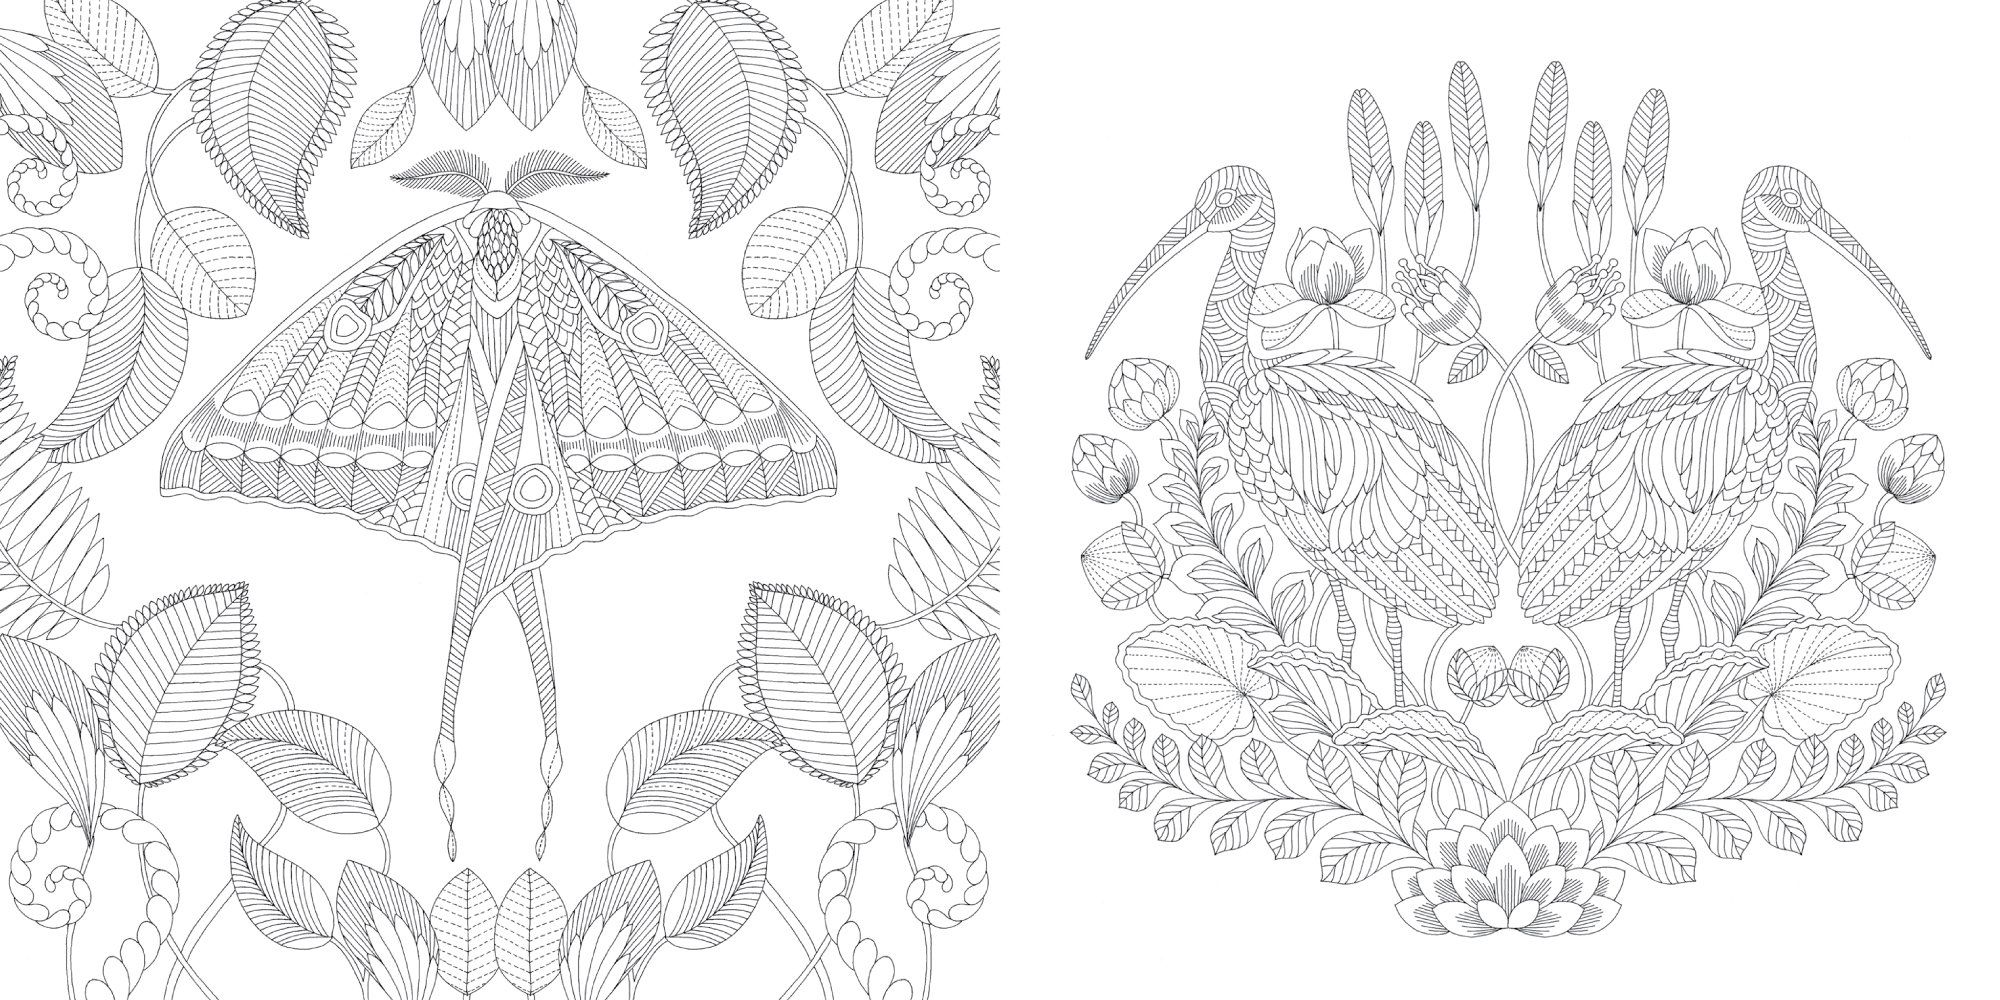 Millie Marottas Tropical Wonderland A Colouring Book Adventure Marotta 9781849942850 Amazon Books